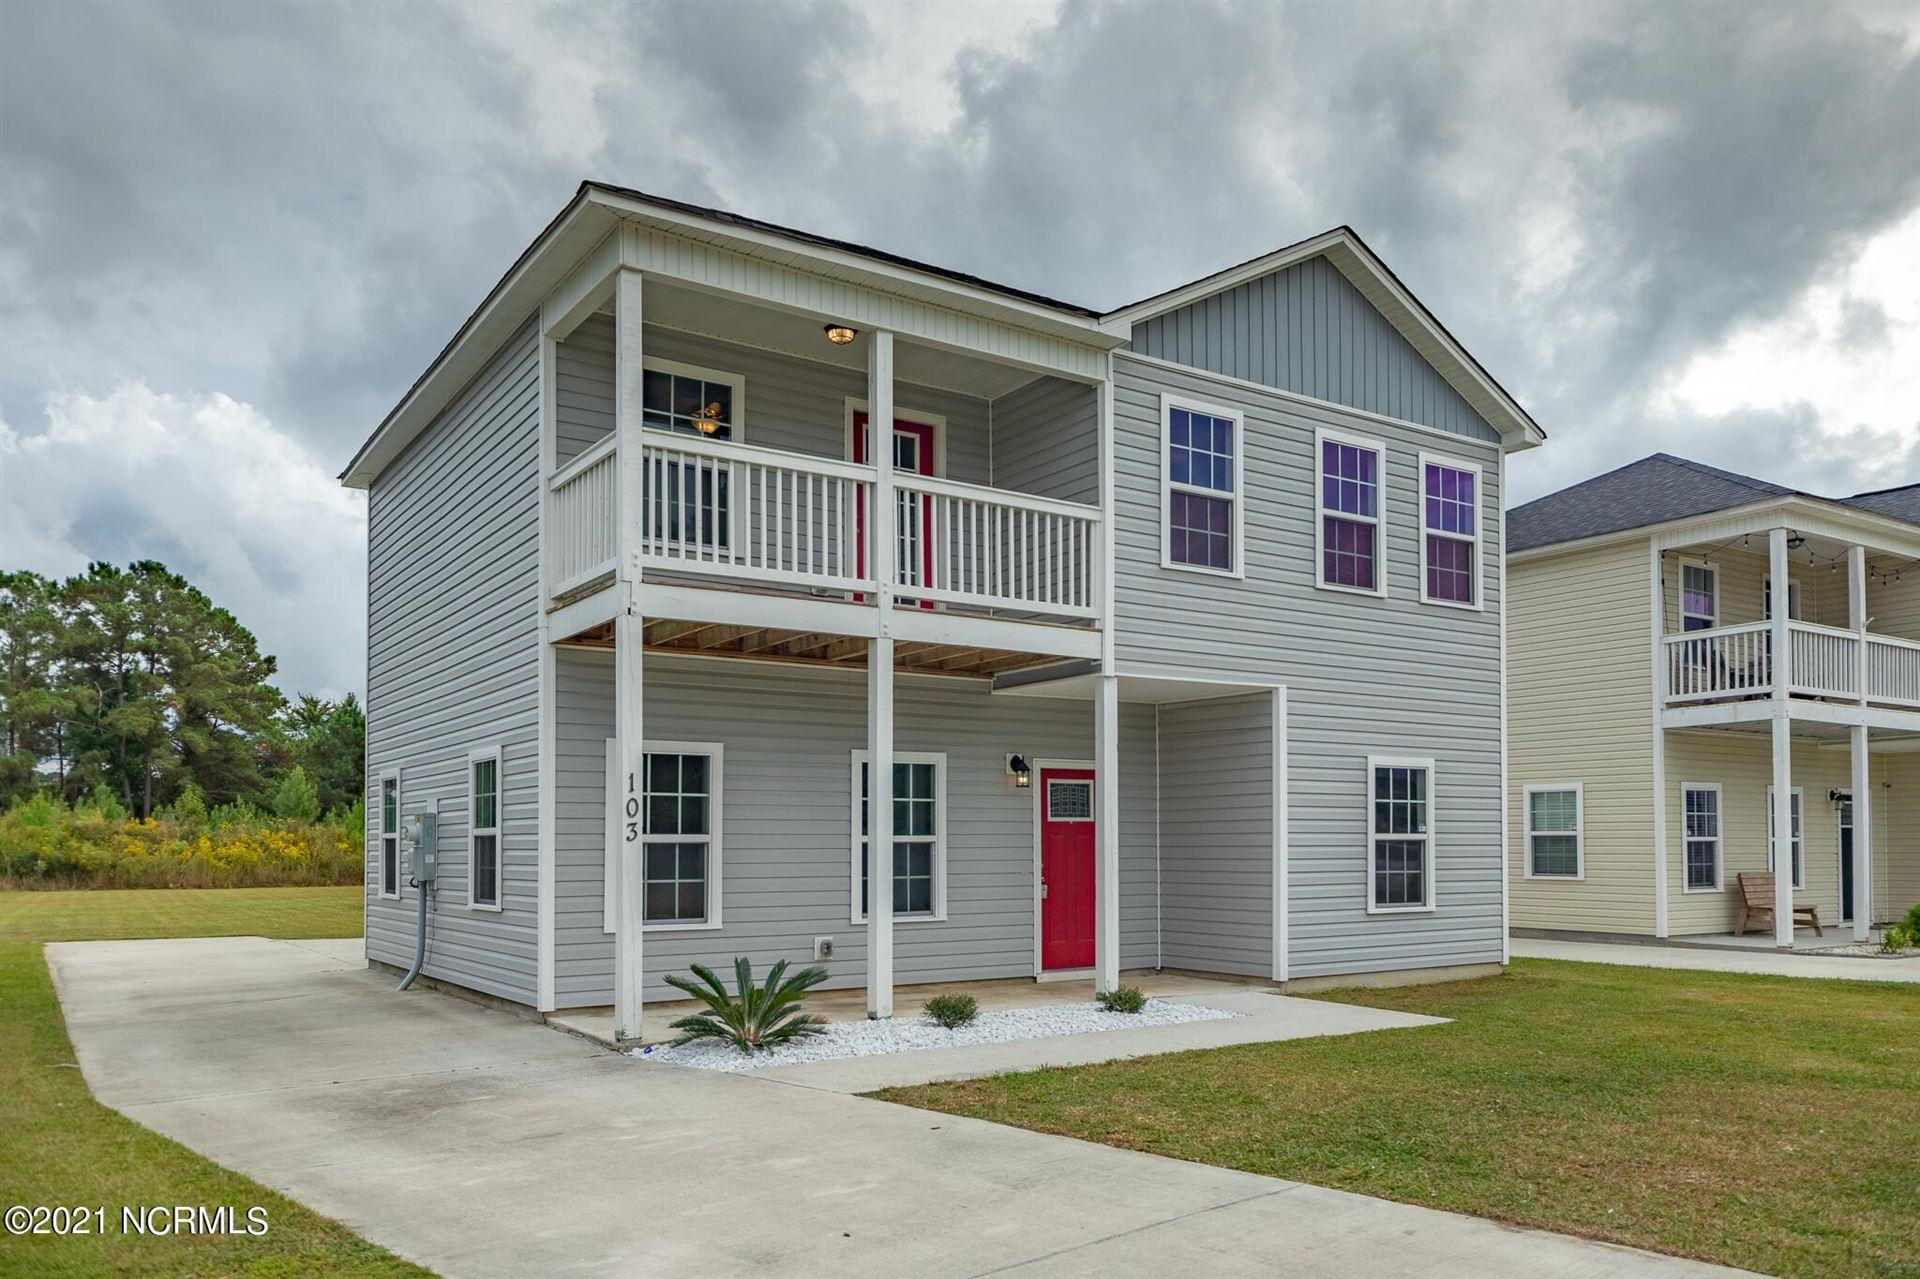 Photo of 103 Garrett Drive, Jacksonville, NC 28546 (MLS # 100293963)